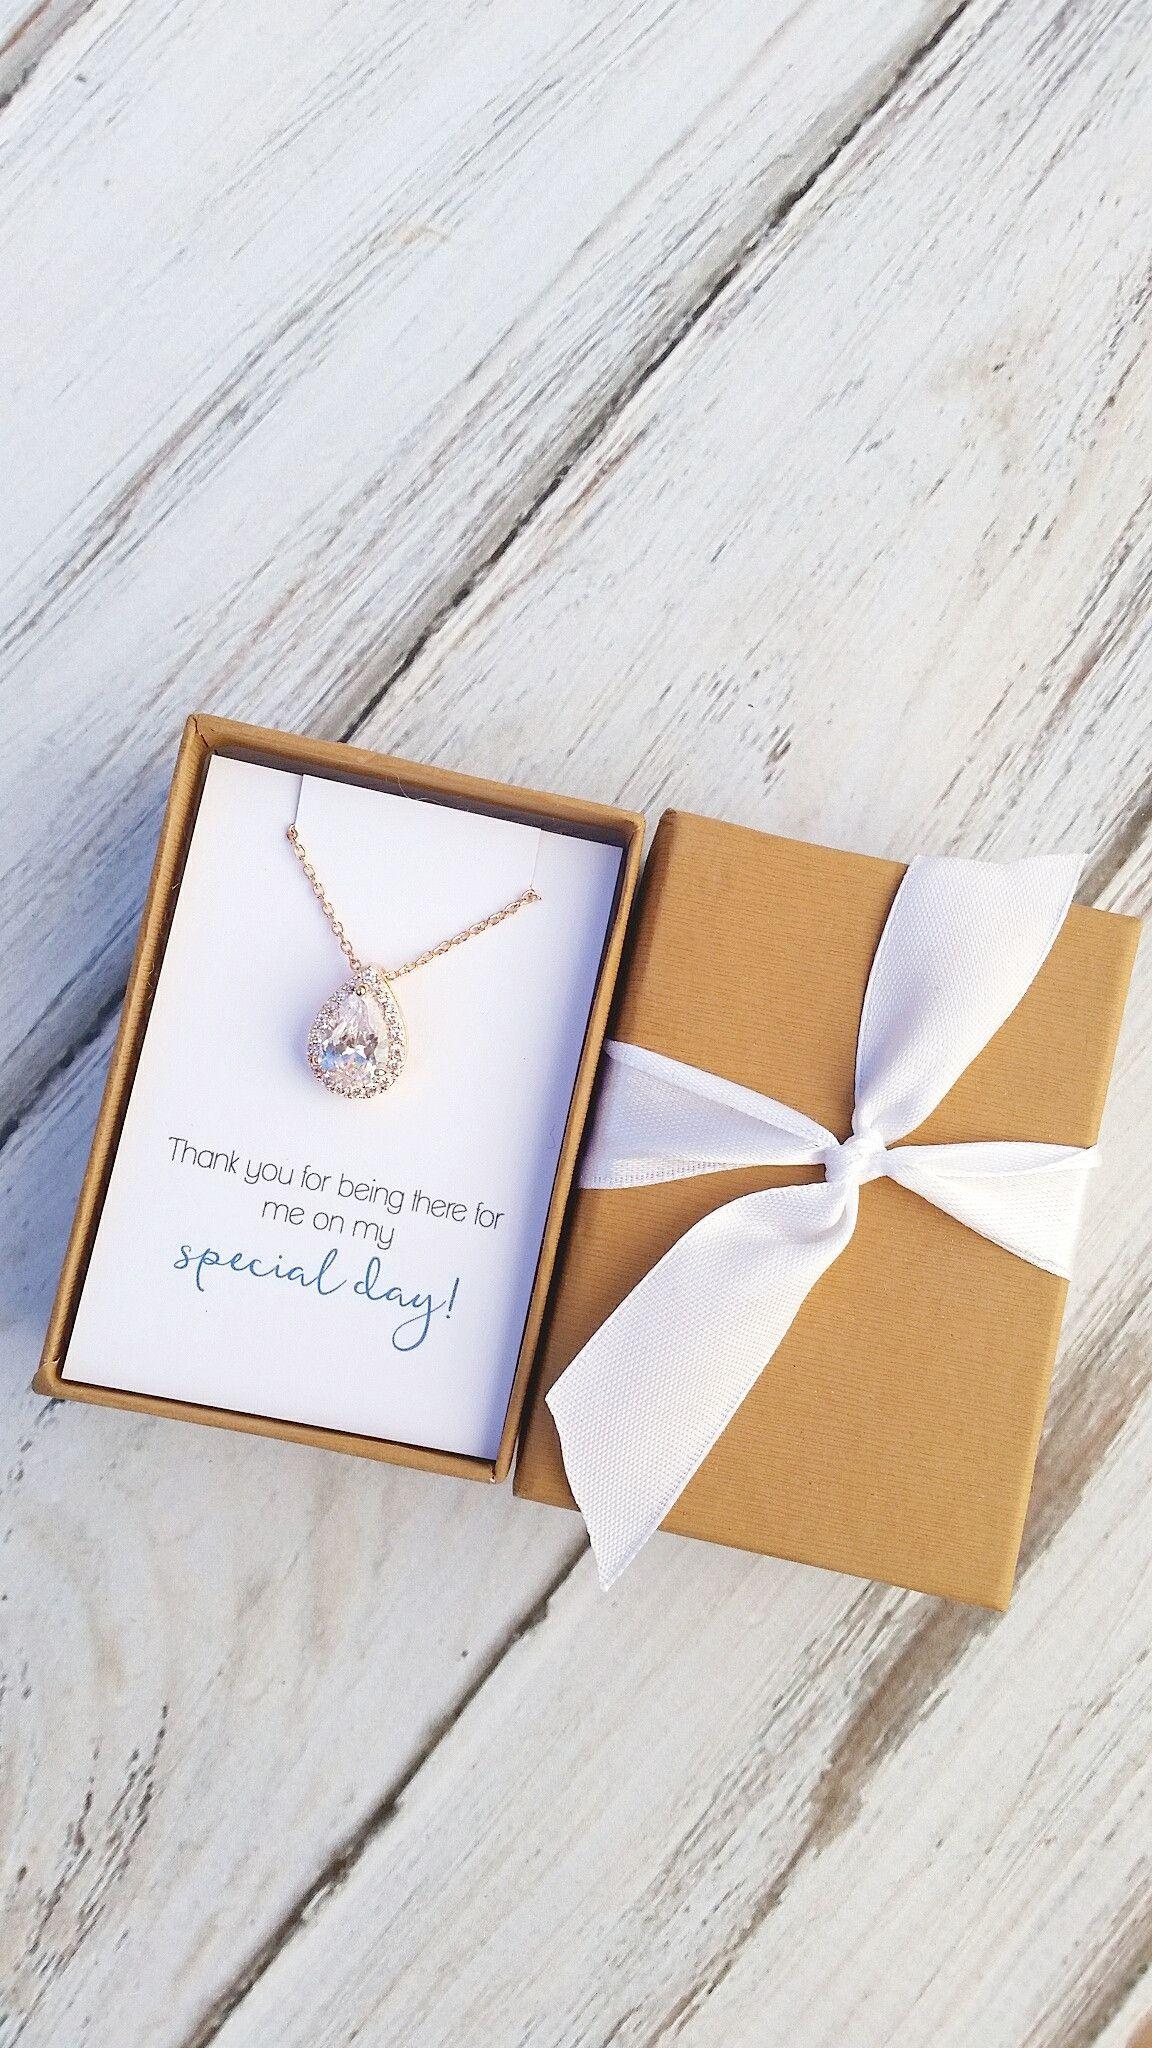 Rose Gold/Gold Teardrop Necklace | Teardrop necklace, Winter wedding ...